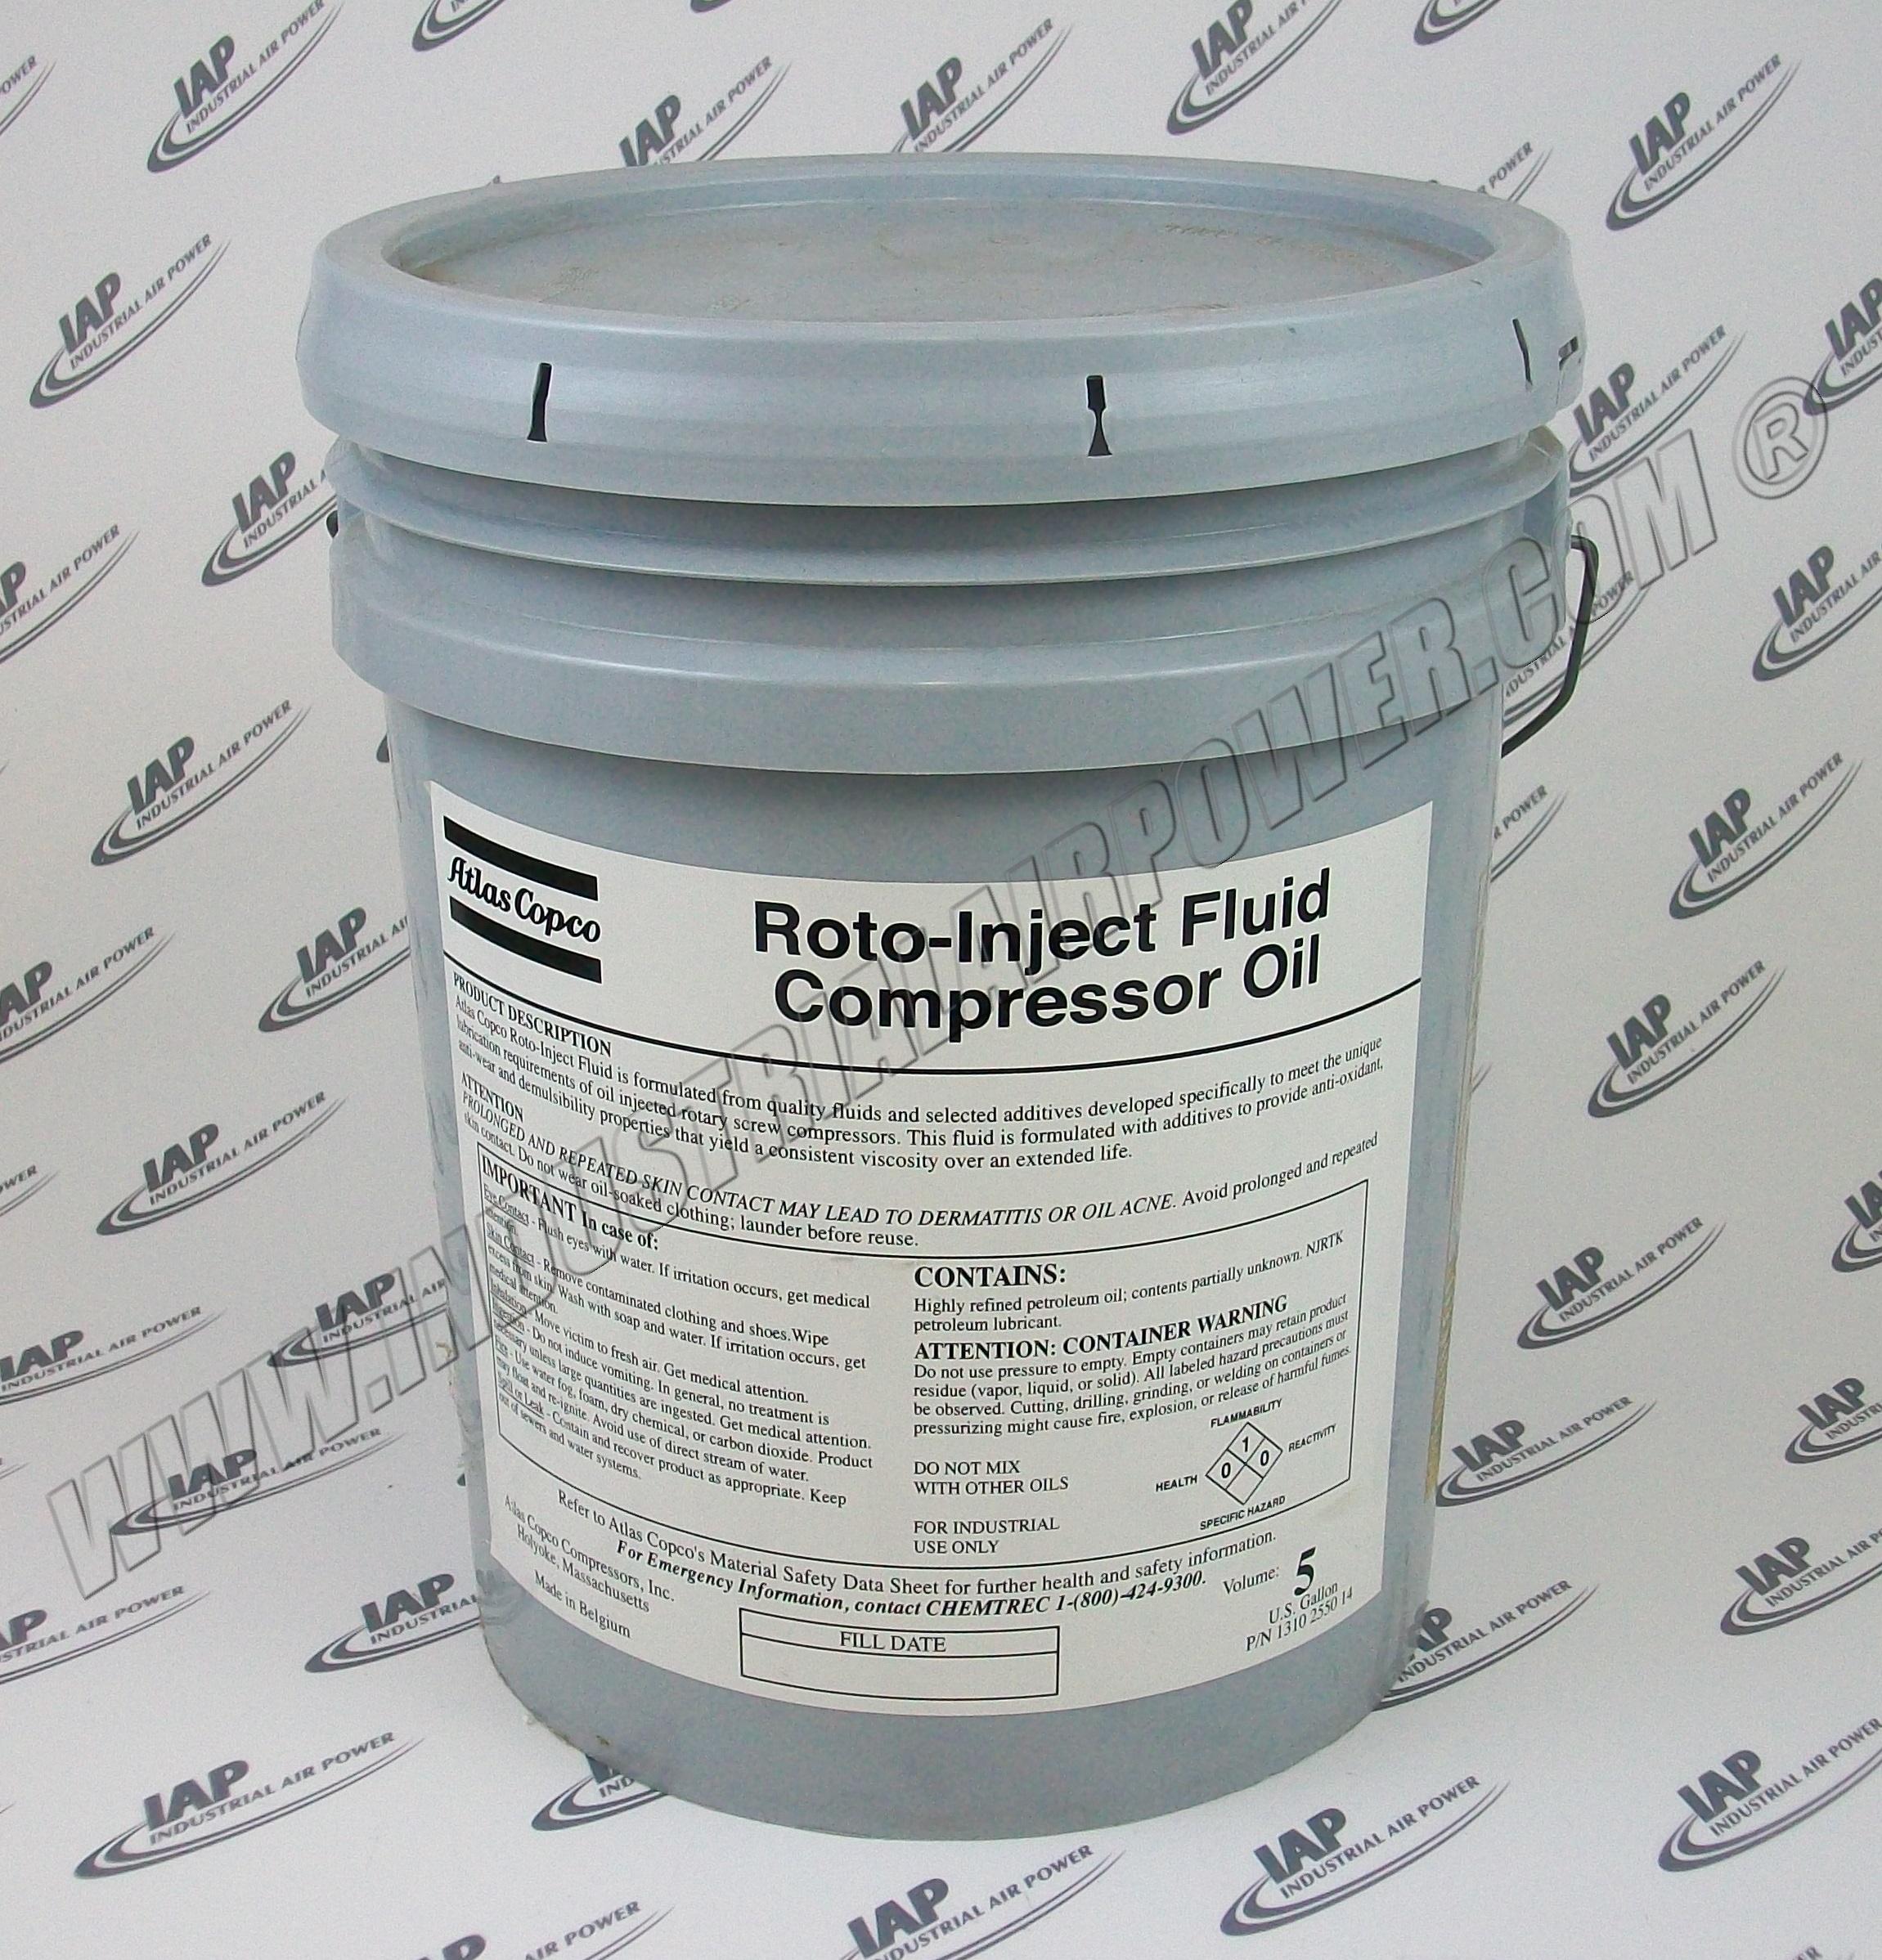 Atlas Copco 1310 2550 14 Roto Inject